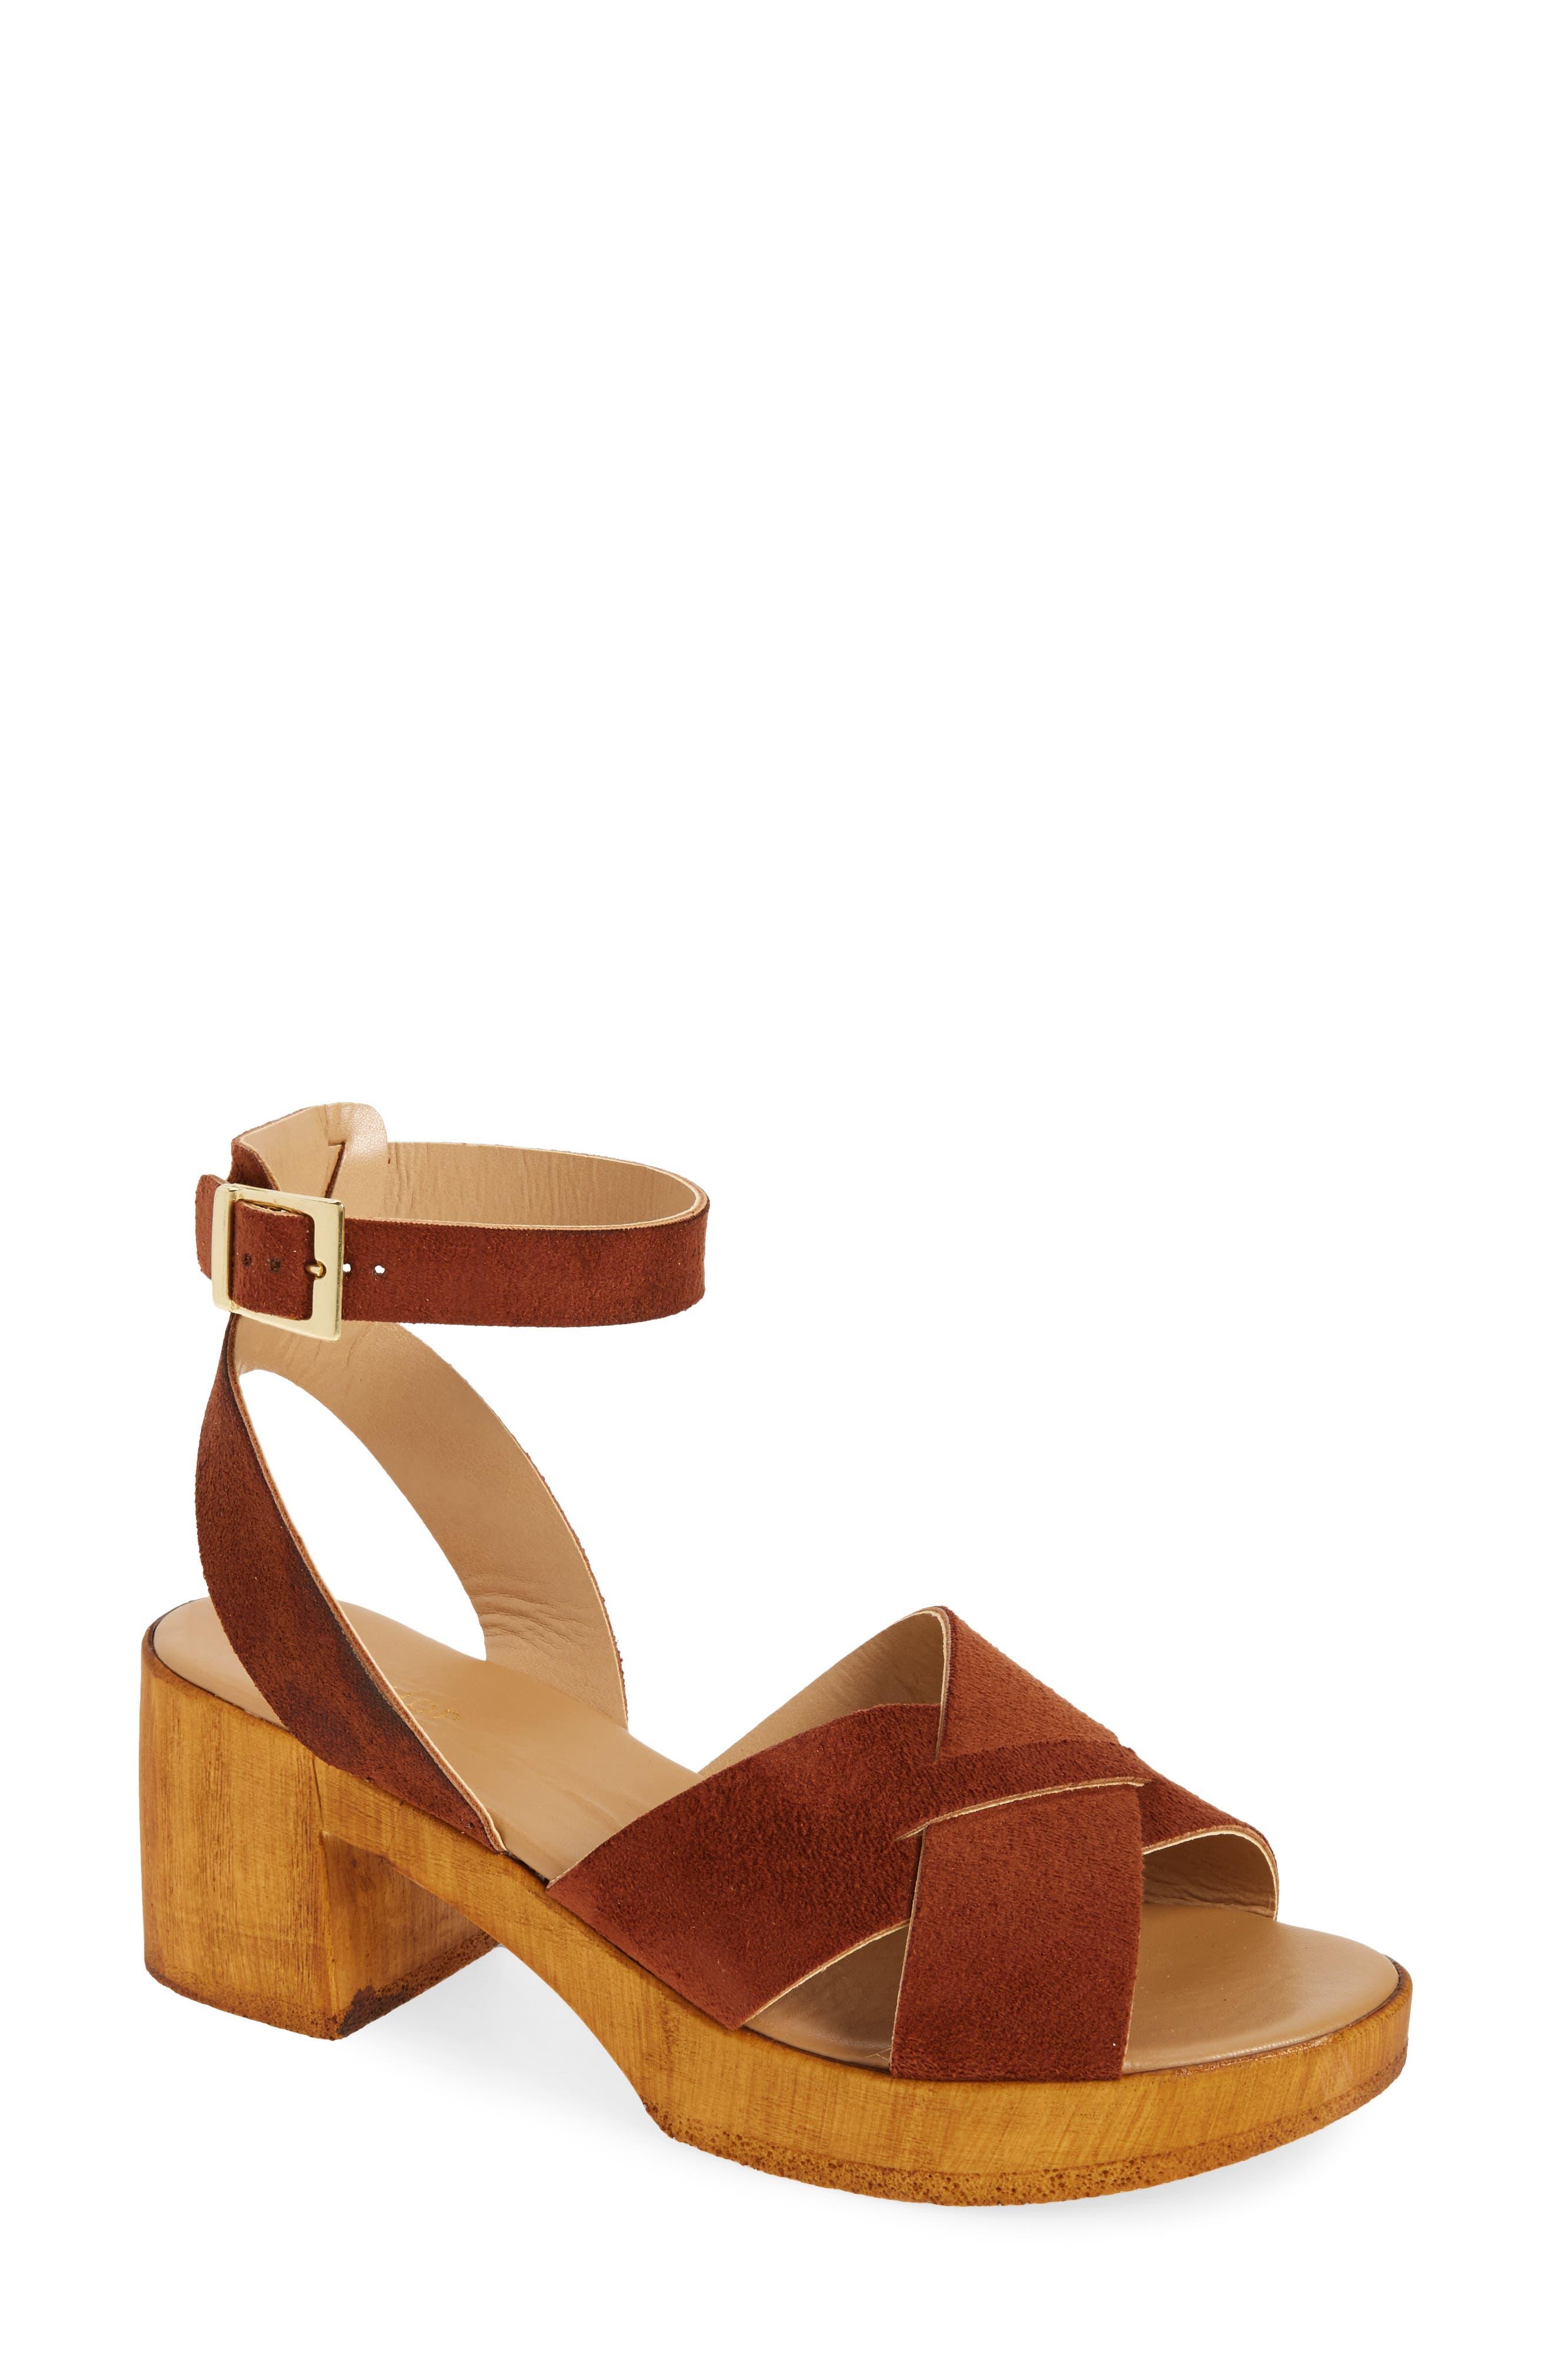 Alternate Image 1 Selected - Topshop Dolly Block Heel Sandal (Women)